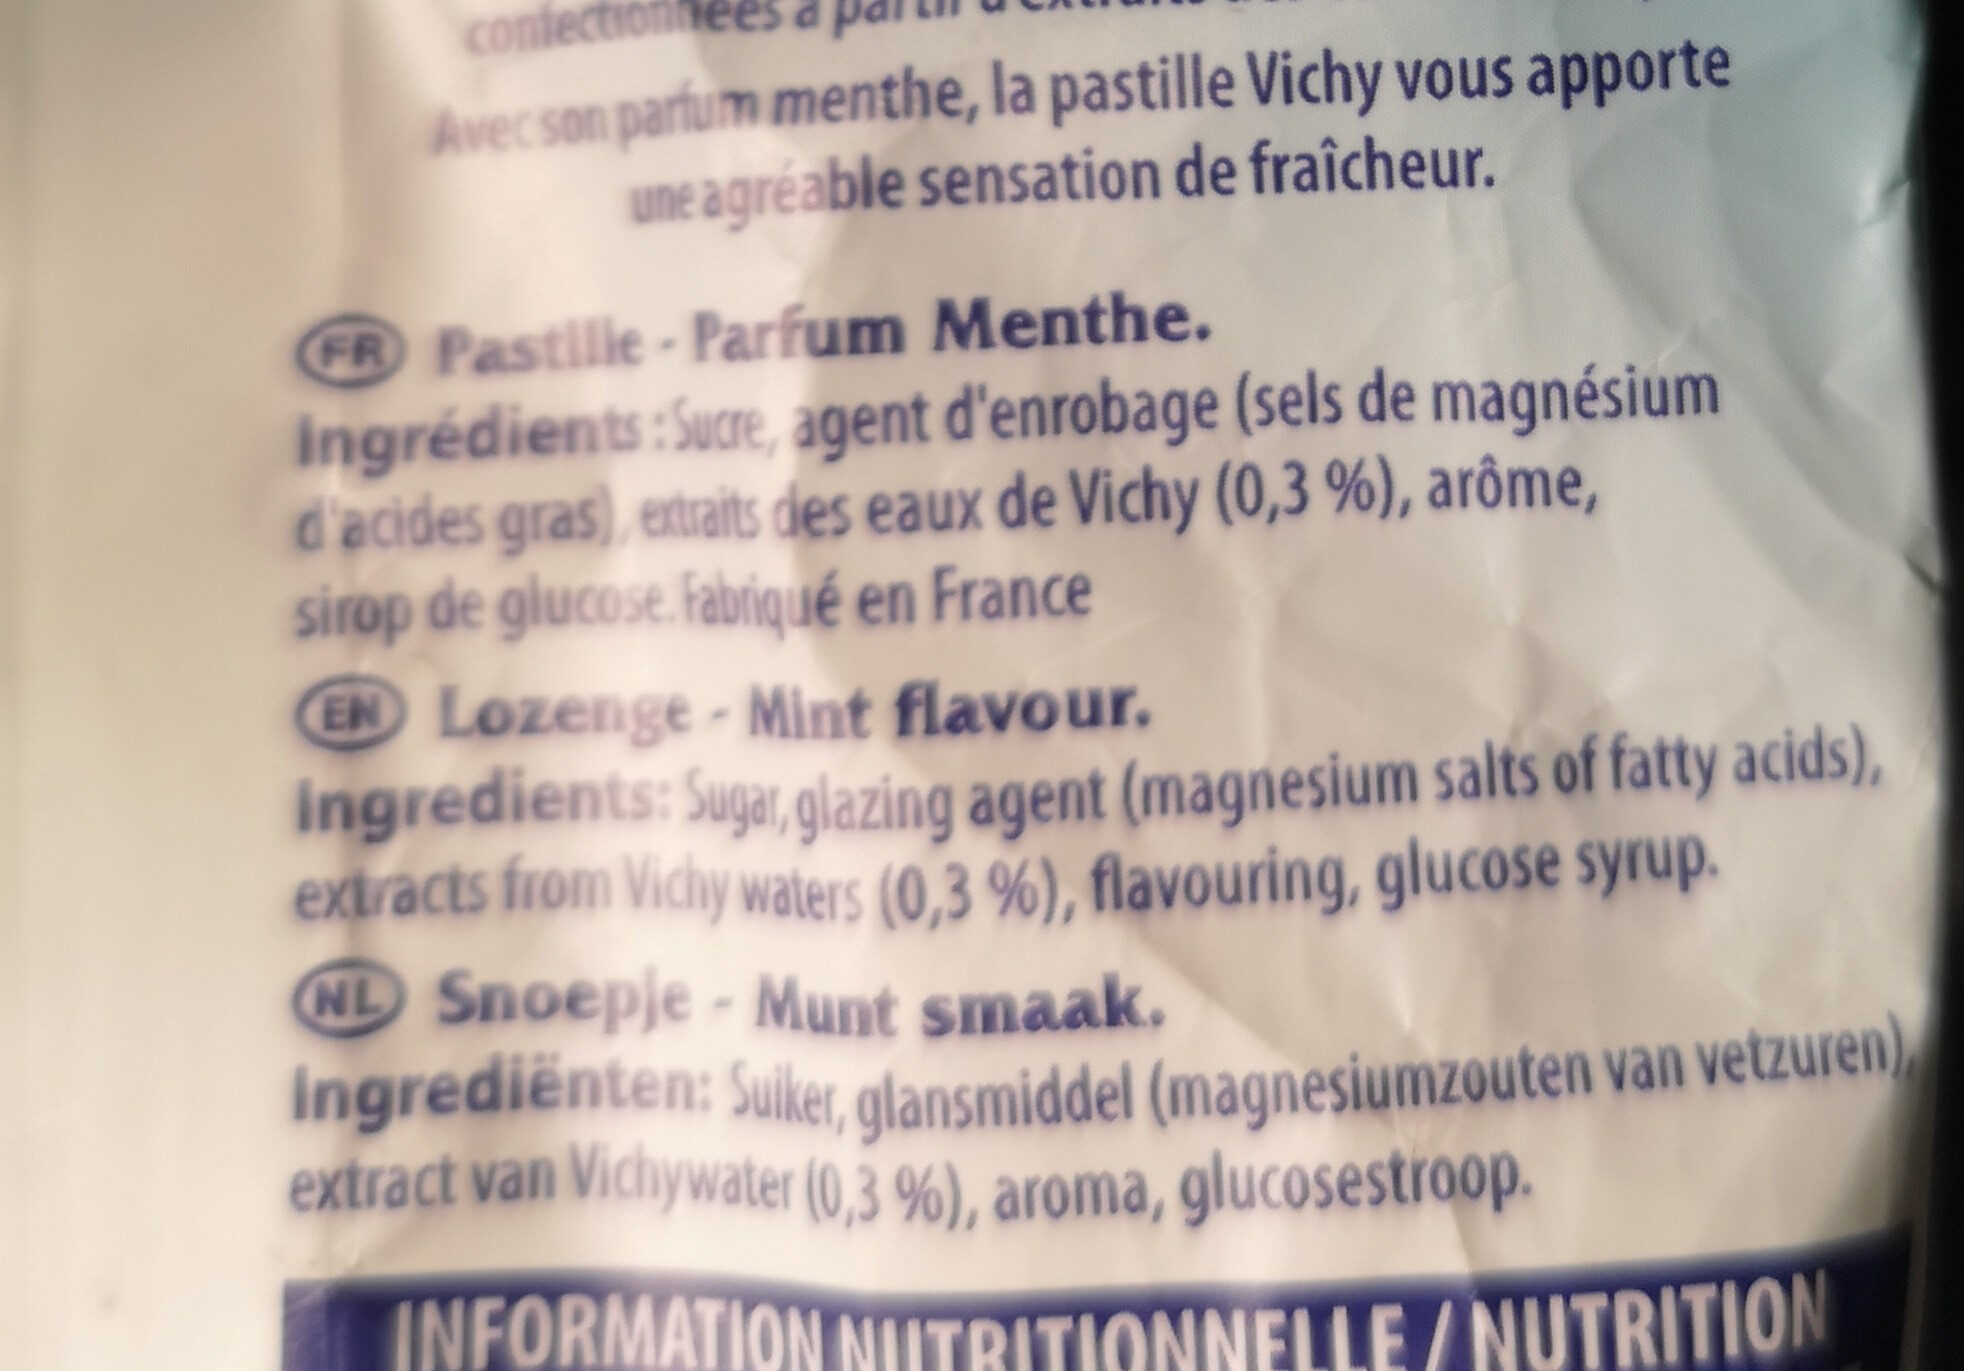 PASTILLES VICHY MENTHE 230G - Ingredientes - fr